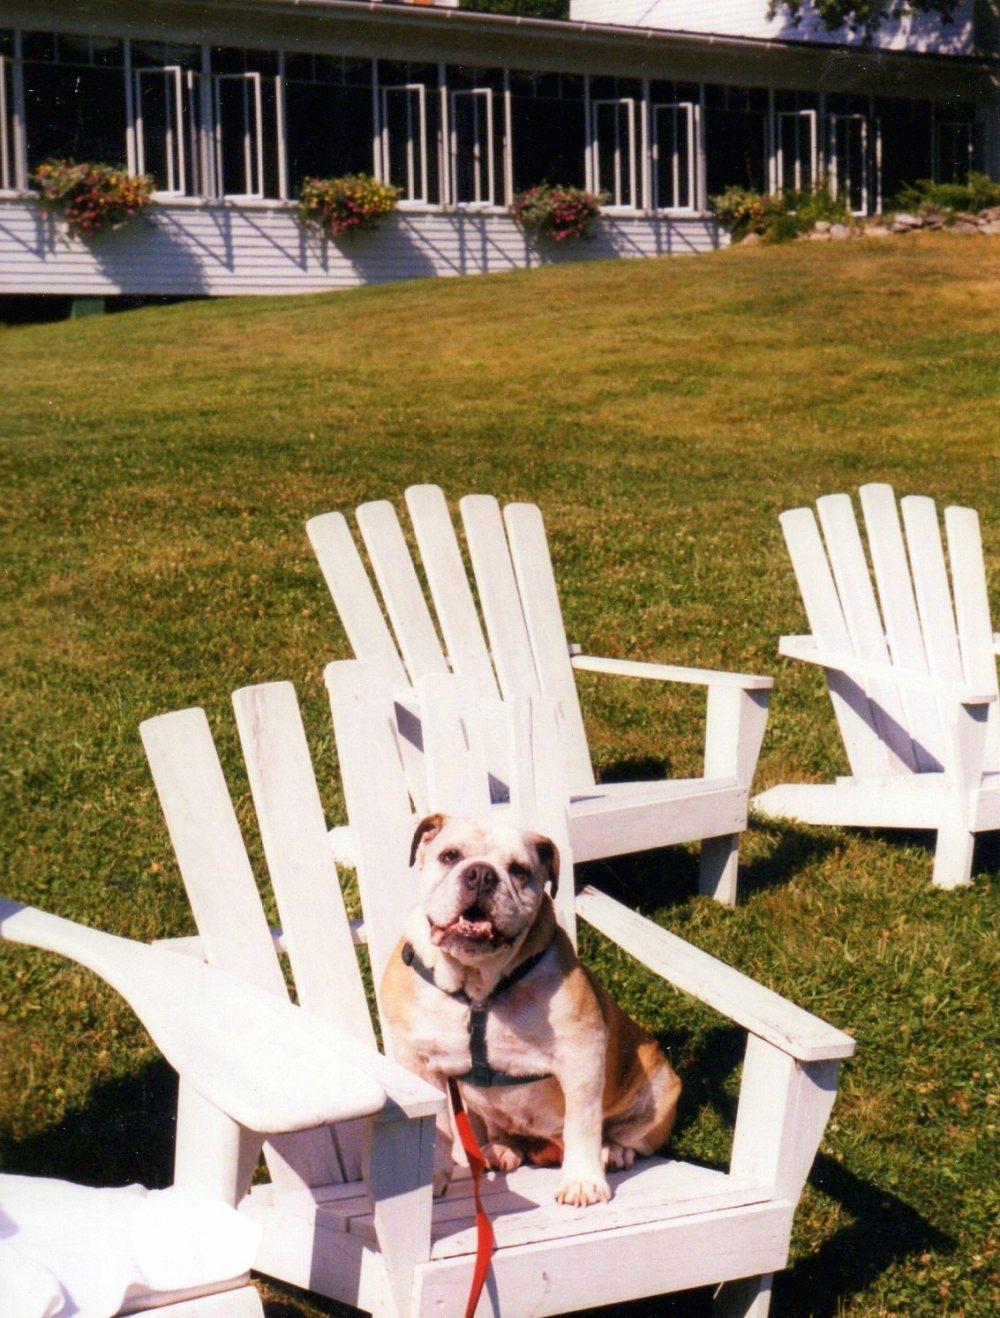 PetuniabulldogadirondackchairLawnmereInnSouthportMElate1990s